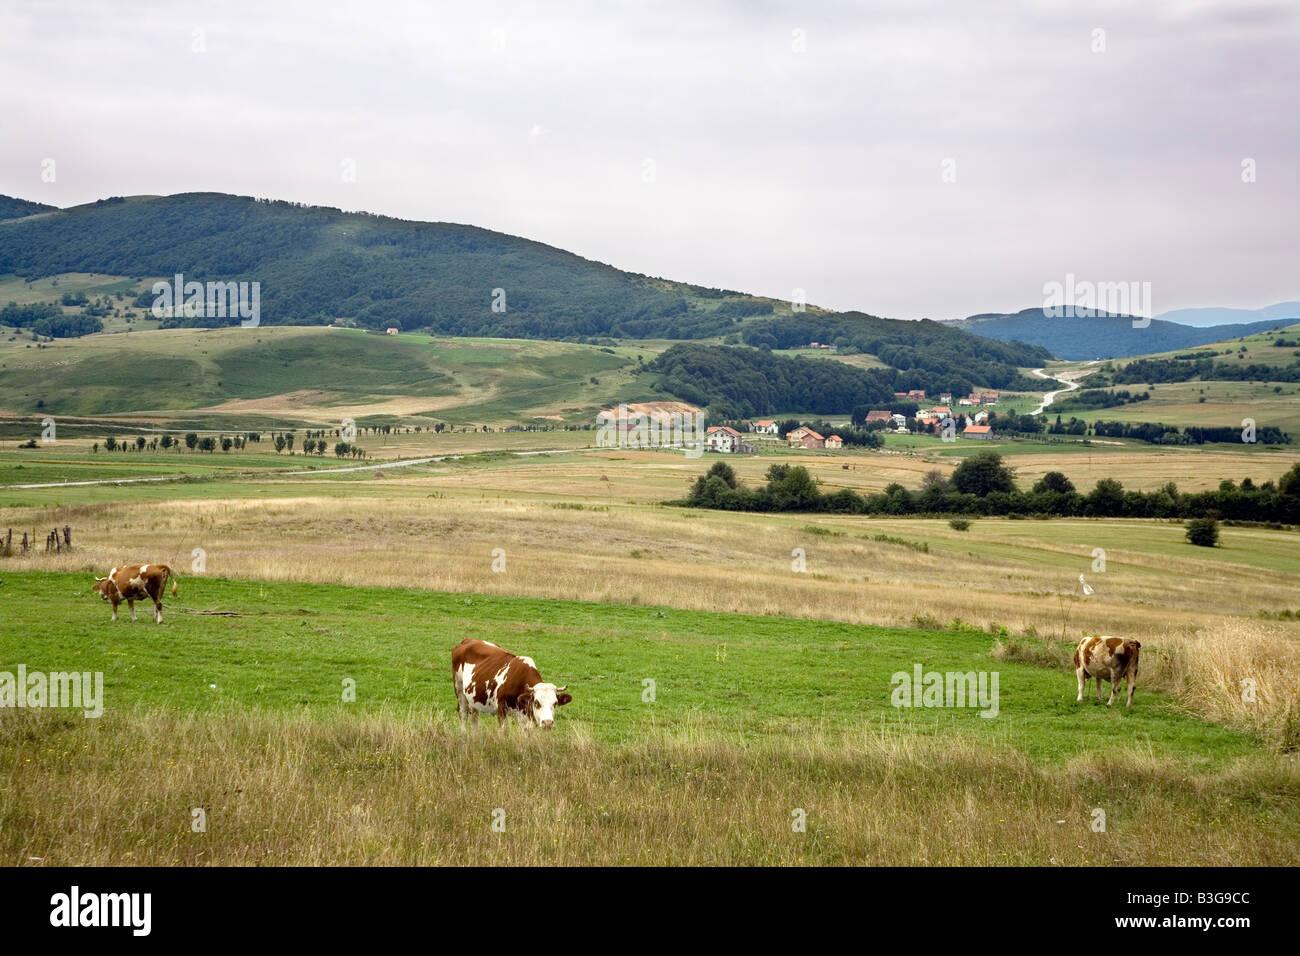 Zmijanje plato on Manjaca Mountain in Bosnia and Herzegovina - Stock Image